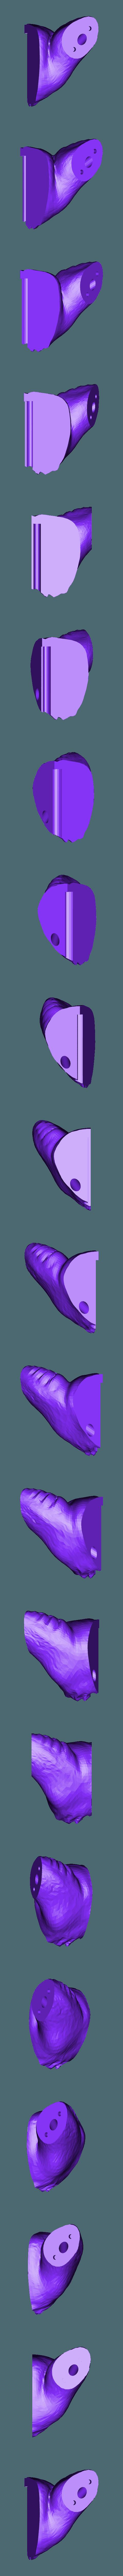 GADGETS legs pt2.stl Download free STL file GADGET the robotic Gremlin • 3D printing object, atarka3